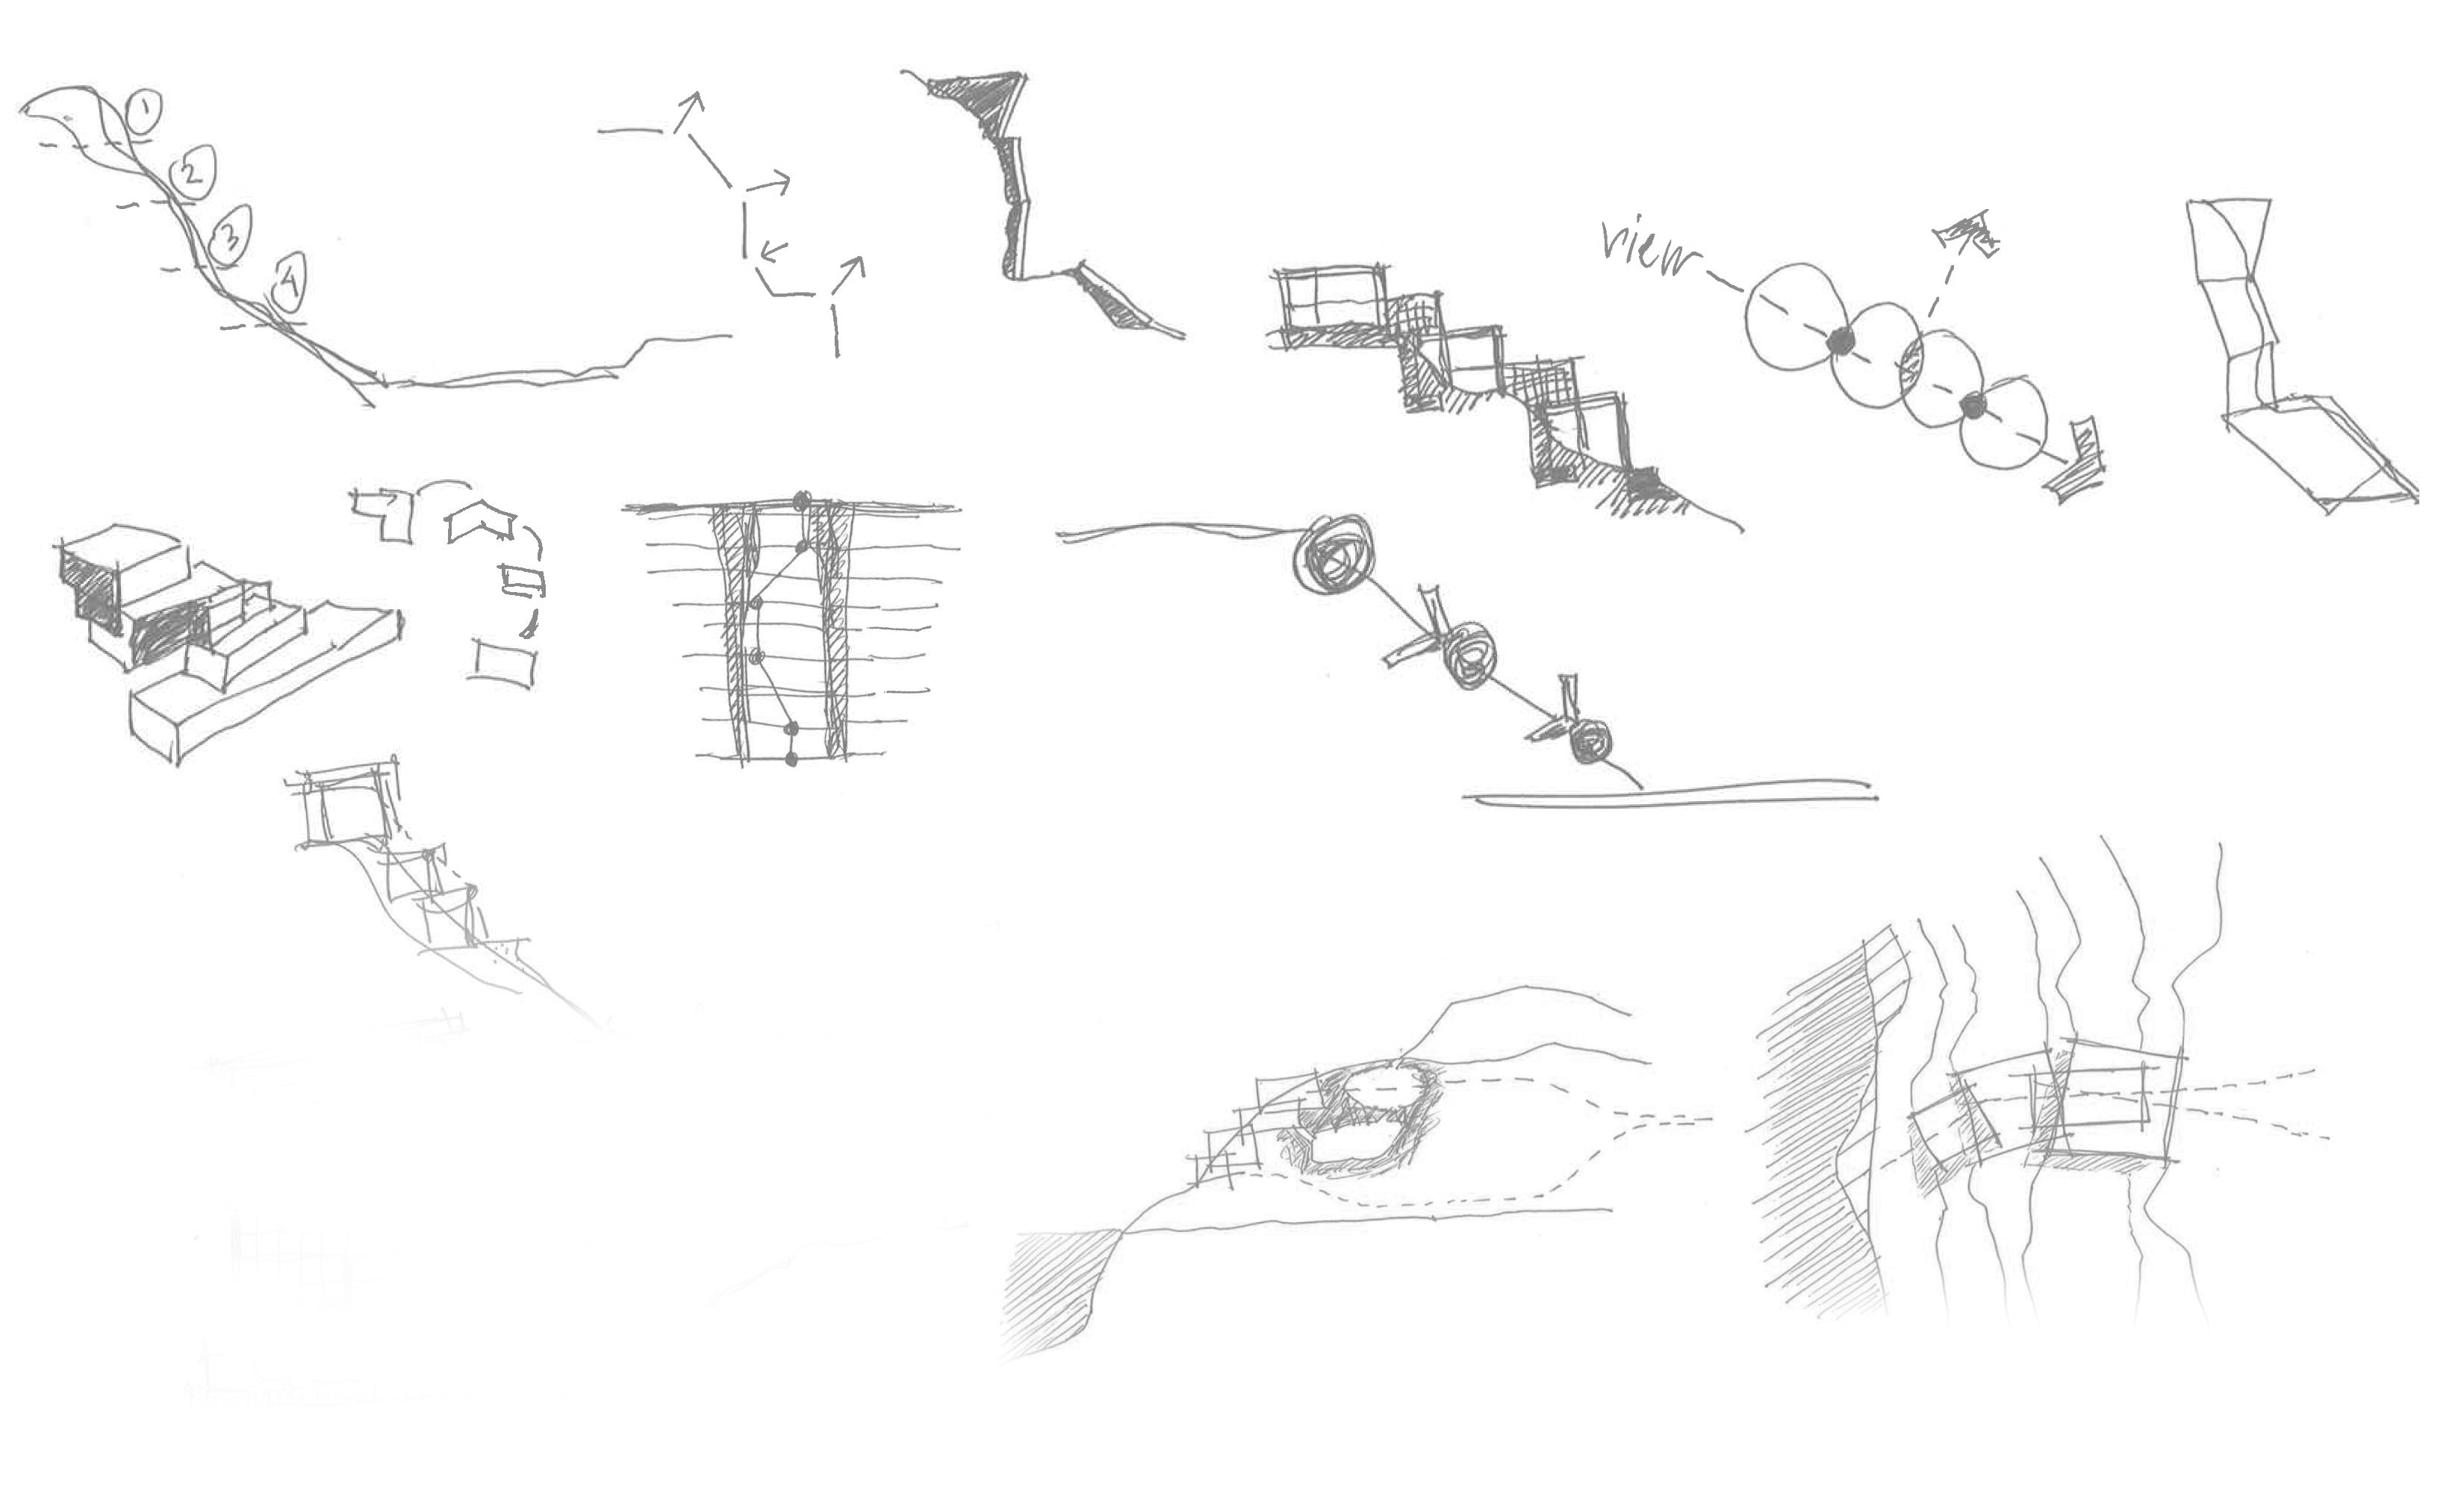 Climb Sketch Ideas